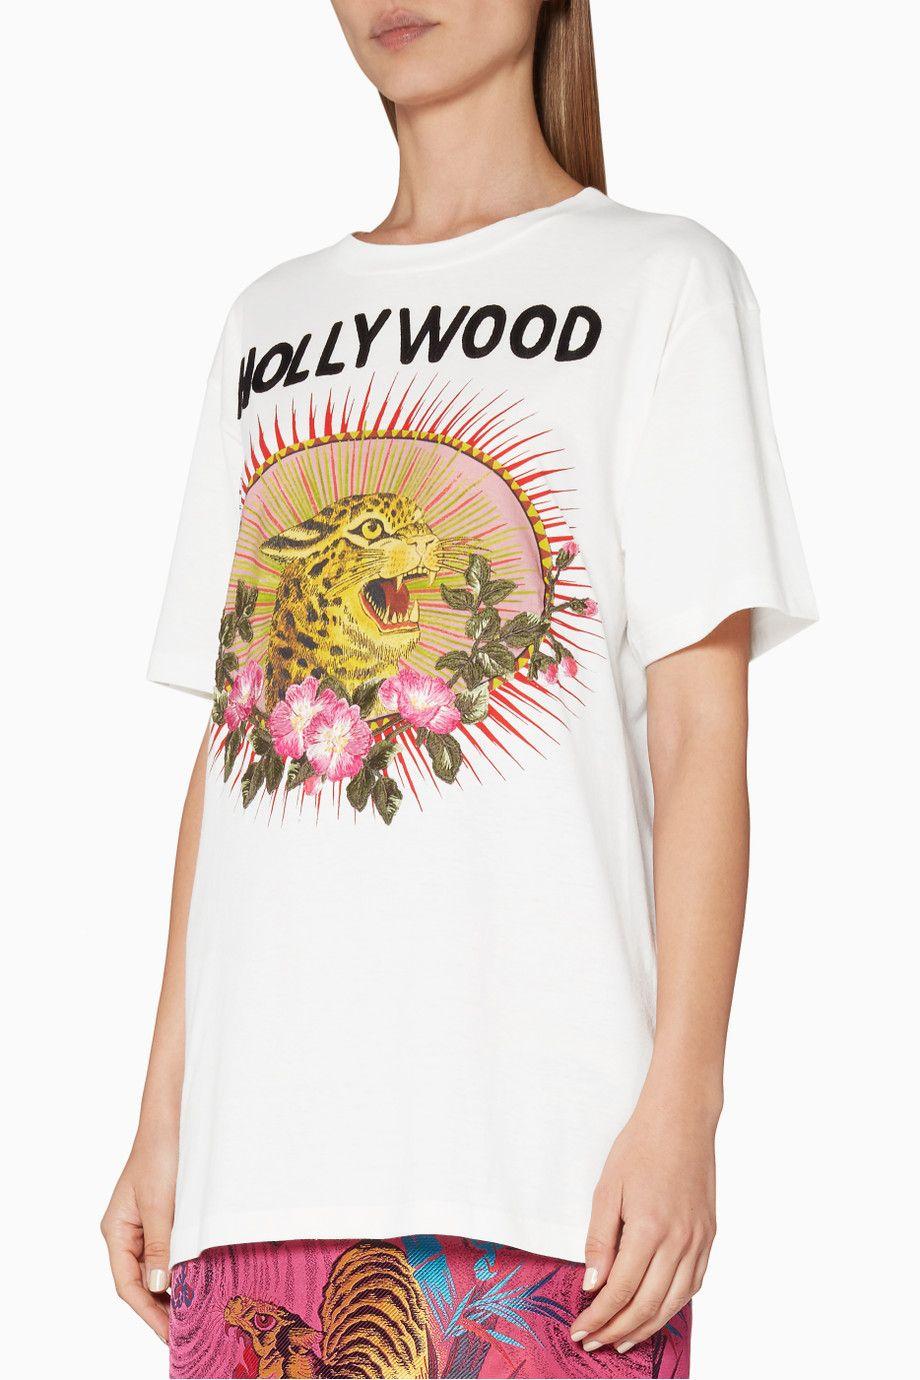 8cee7eb45b64 Shop Luxury Gucci White Tiger   Hollywood Logo Printed T-Shirt ...